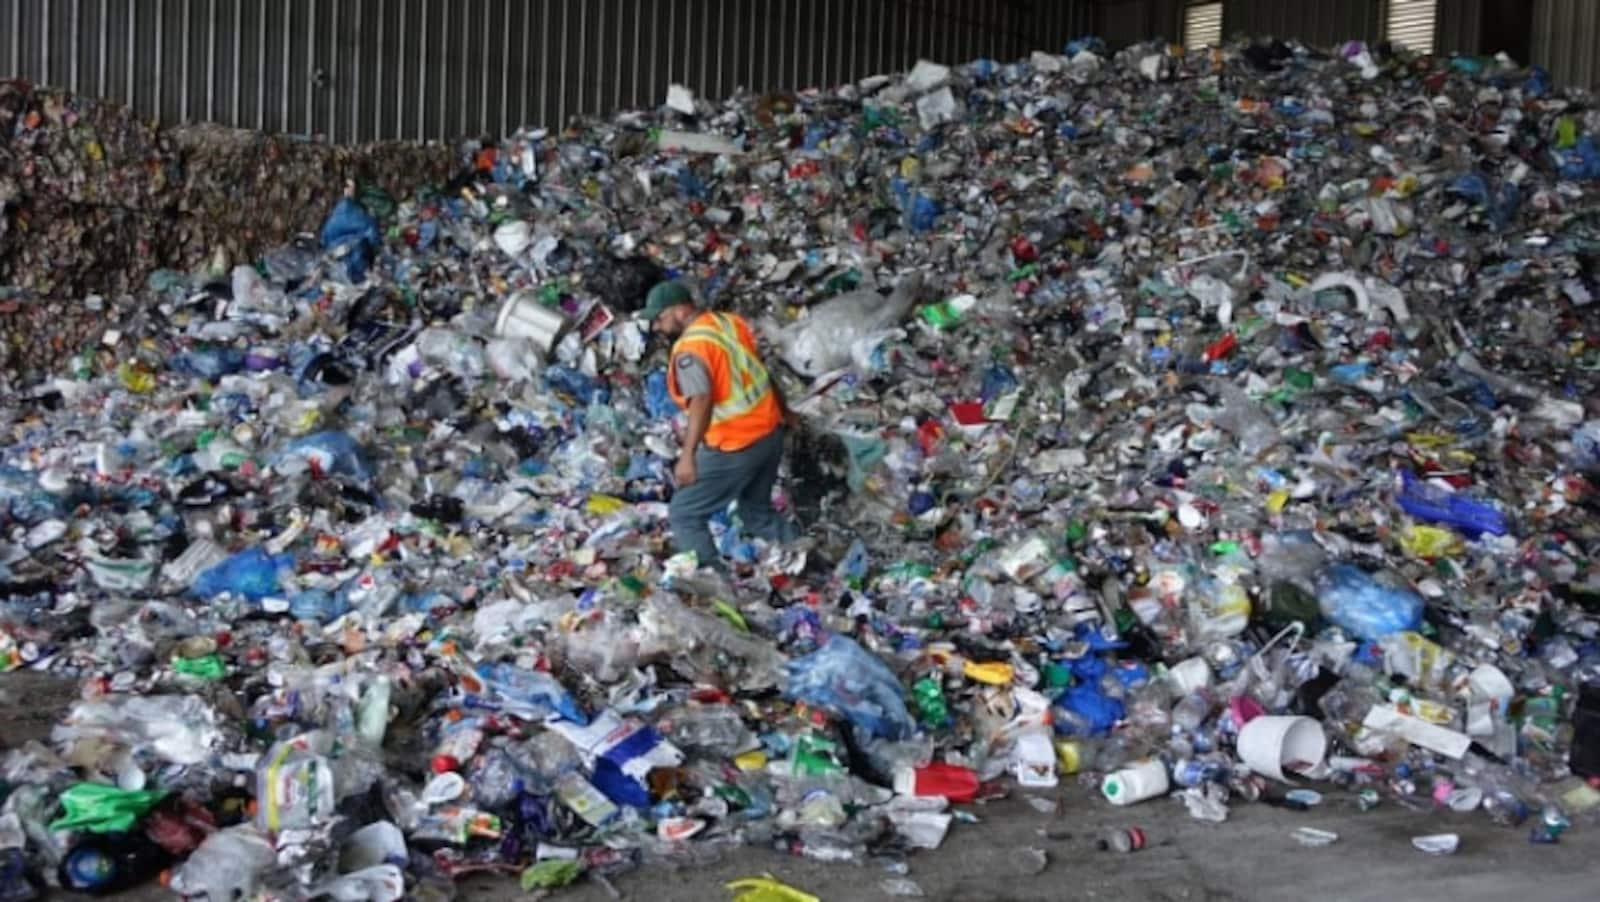 Un monticule de matières recyclables.